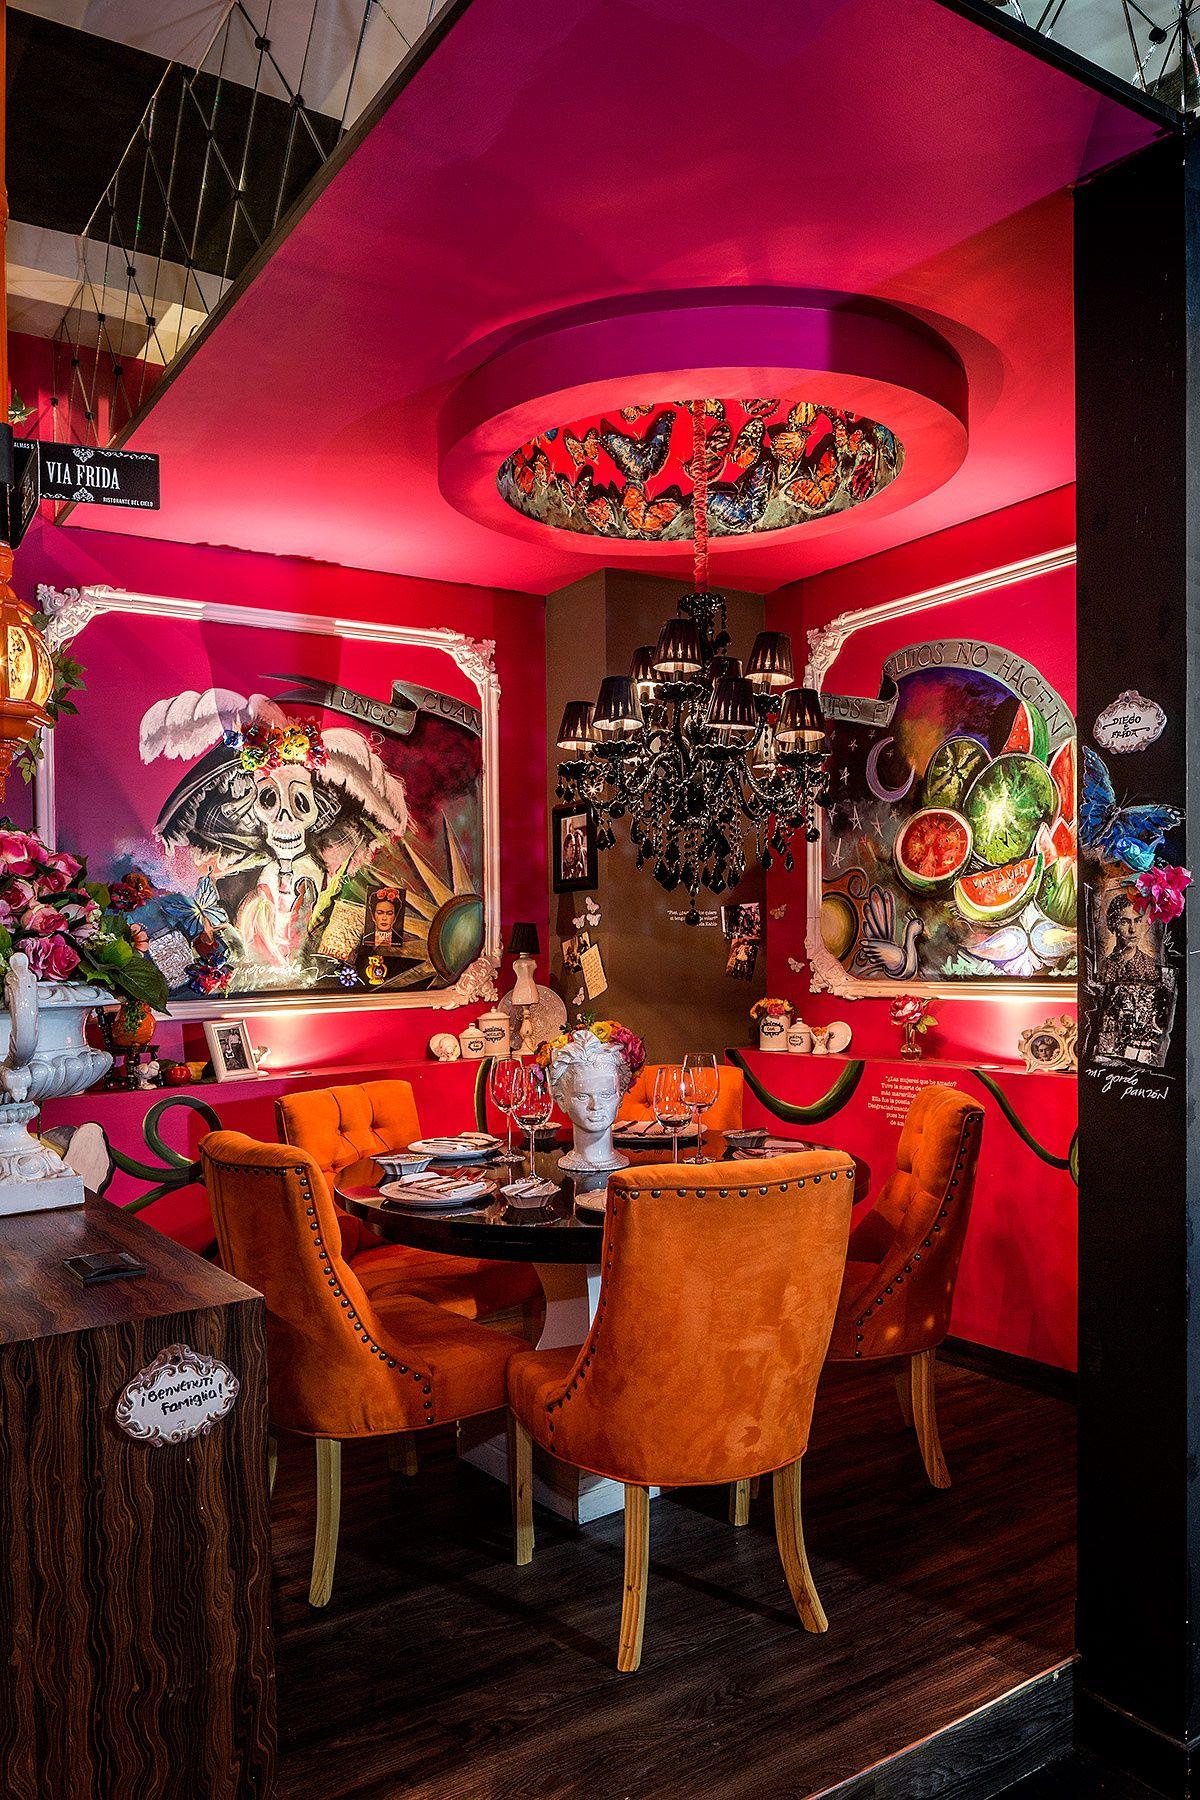 Restaurante mexicano bel cielo 278343757 1200x1800 decor for Decoracion estilo mexicano moderno